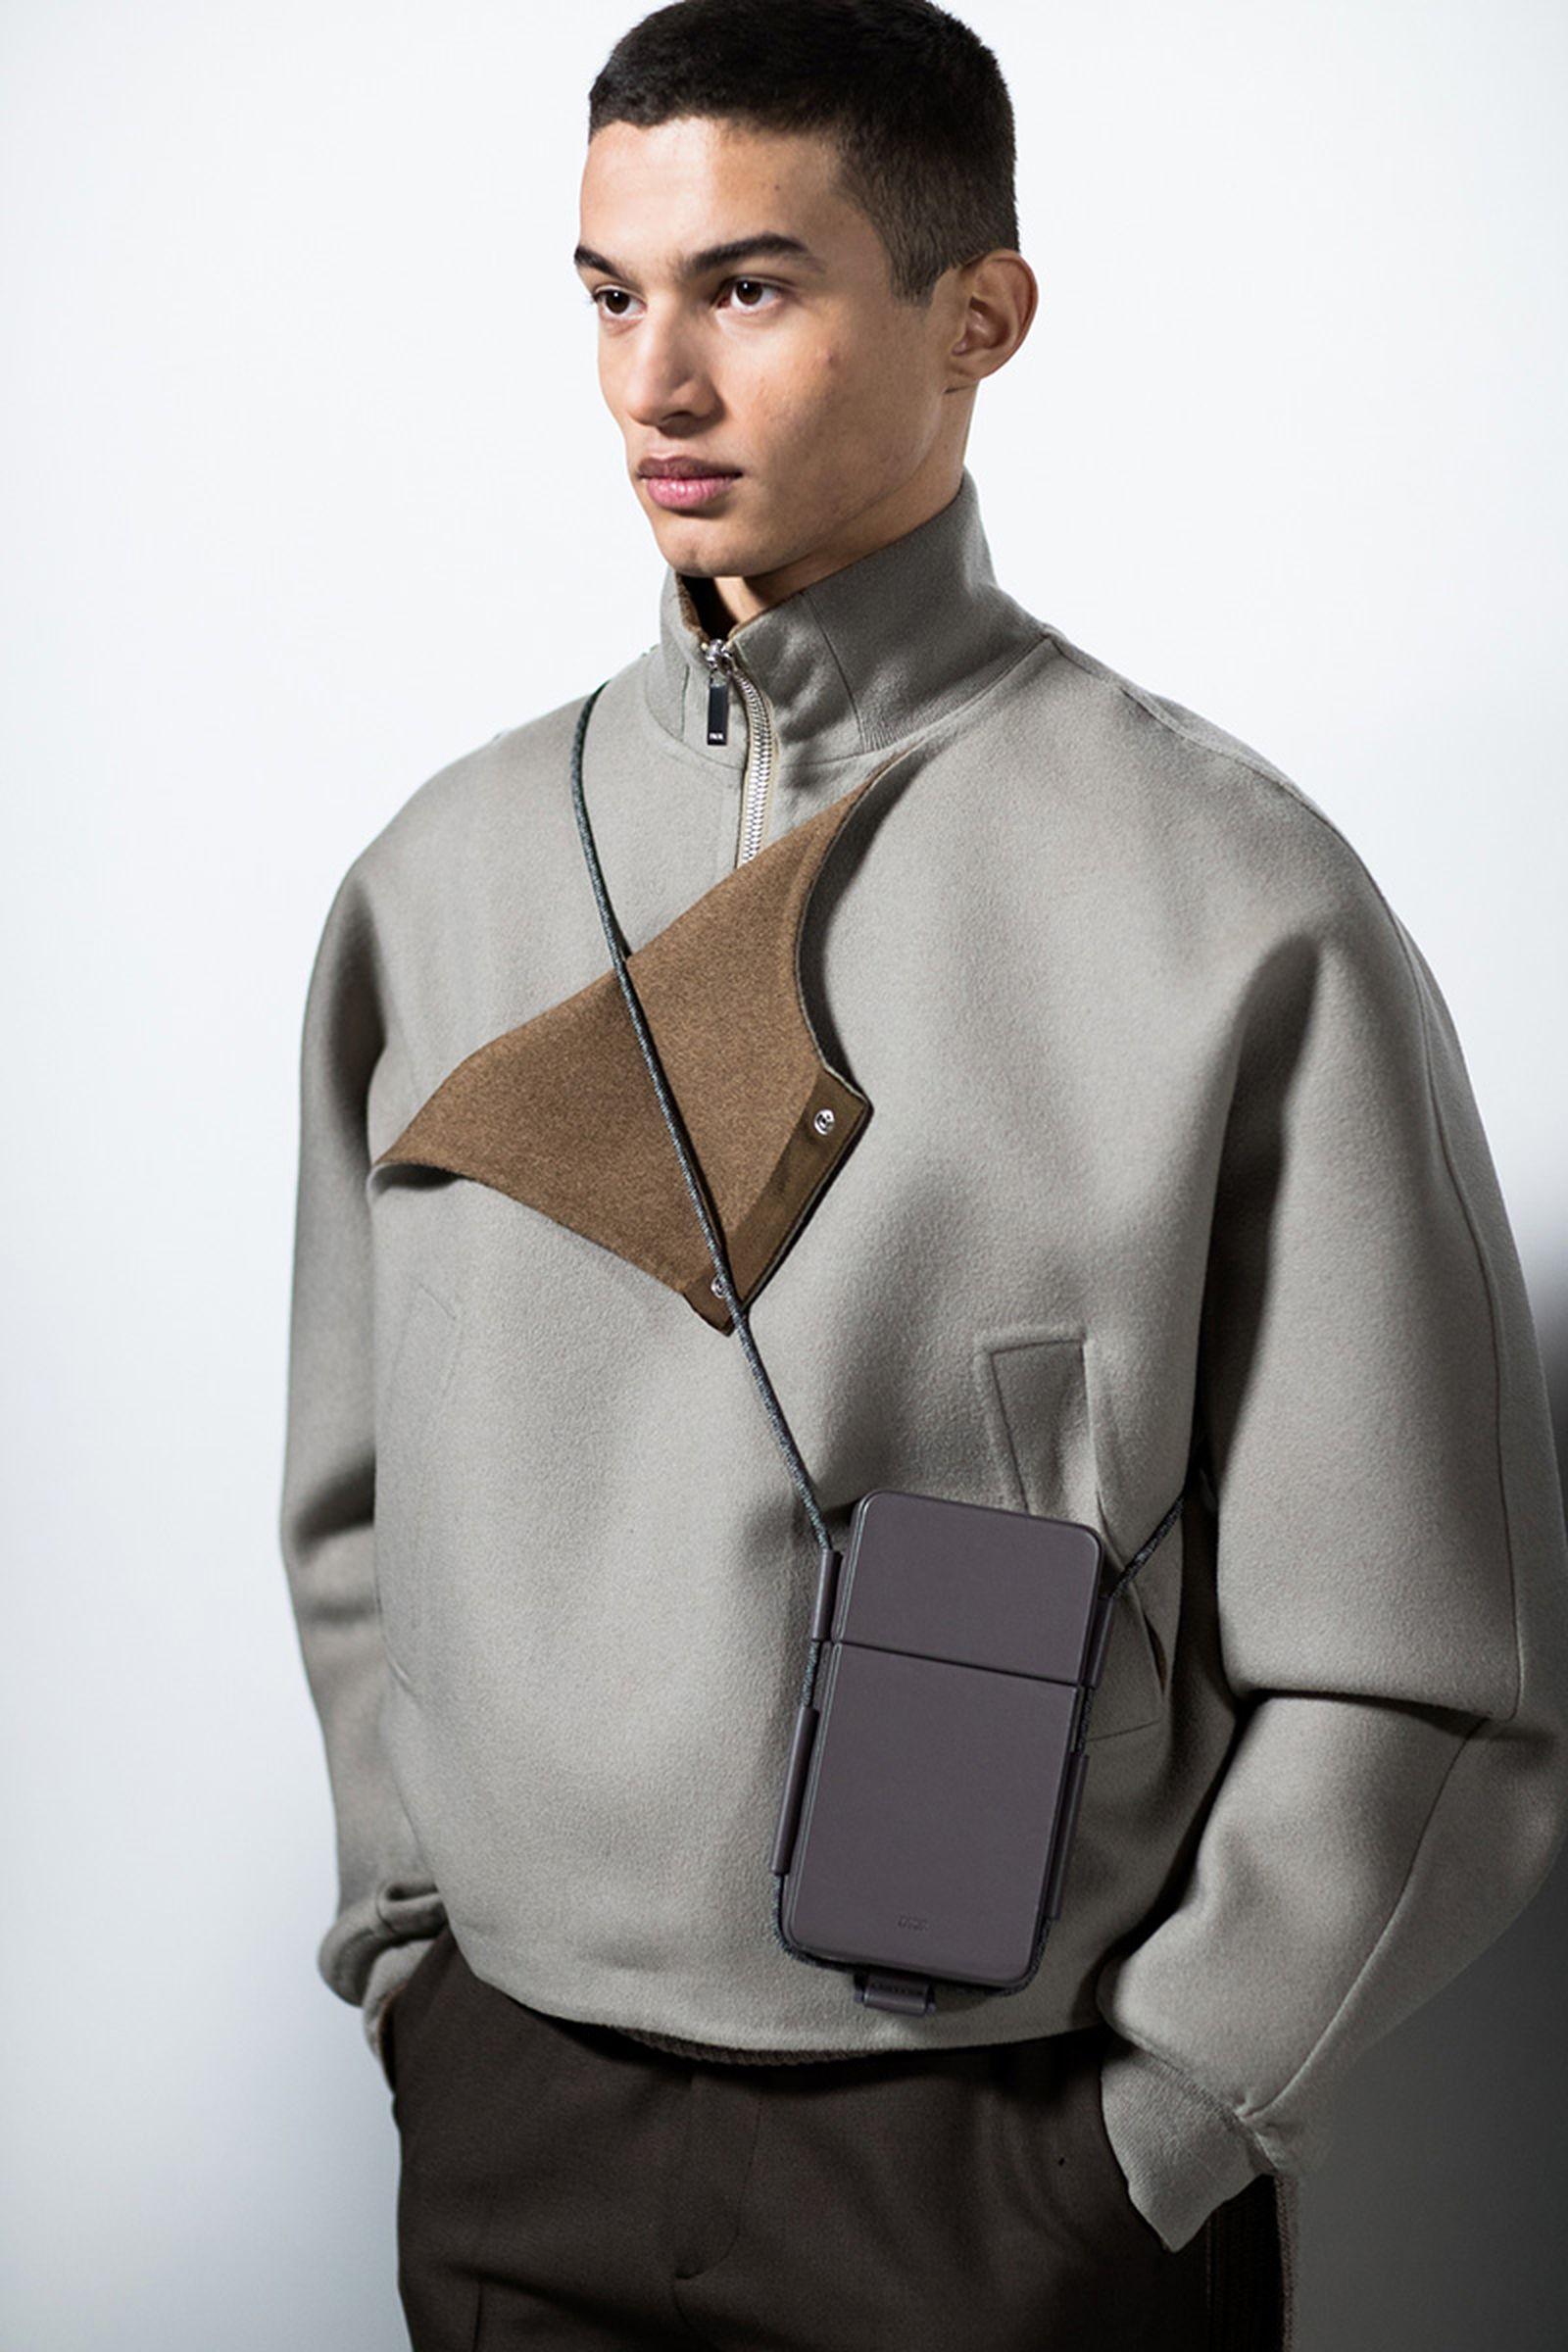 mens purses are coming Acne Studios Fendi Louis Vuitton